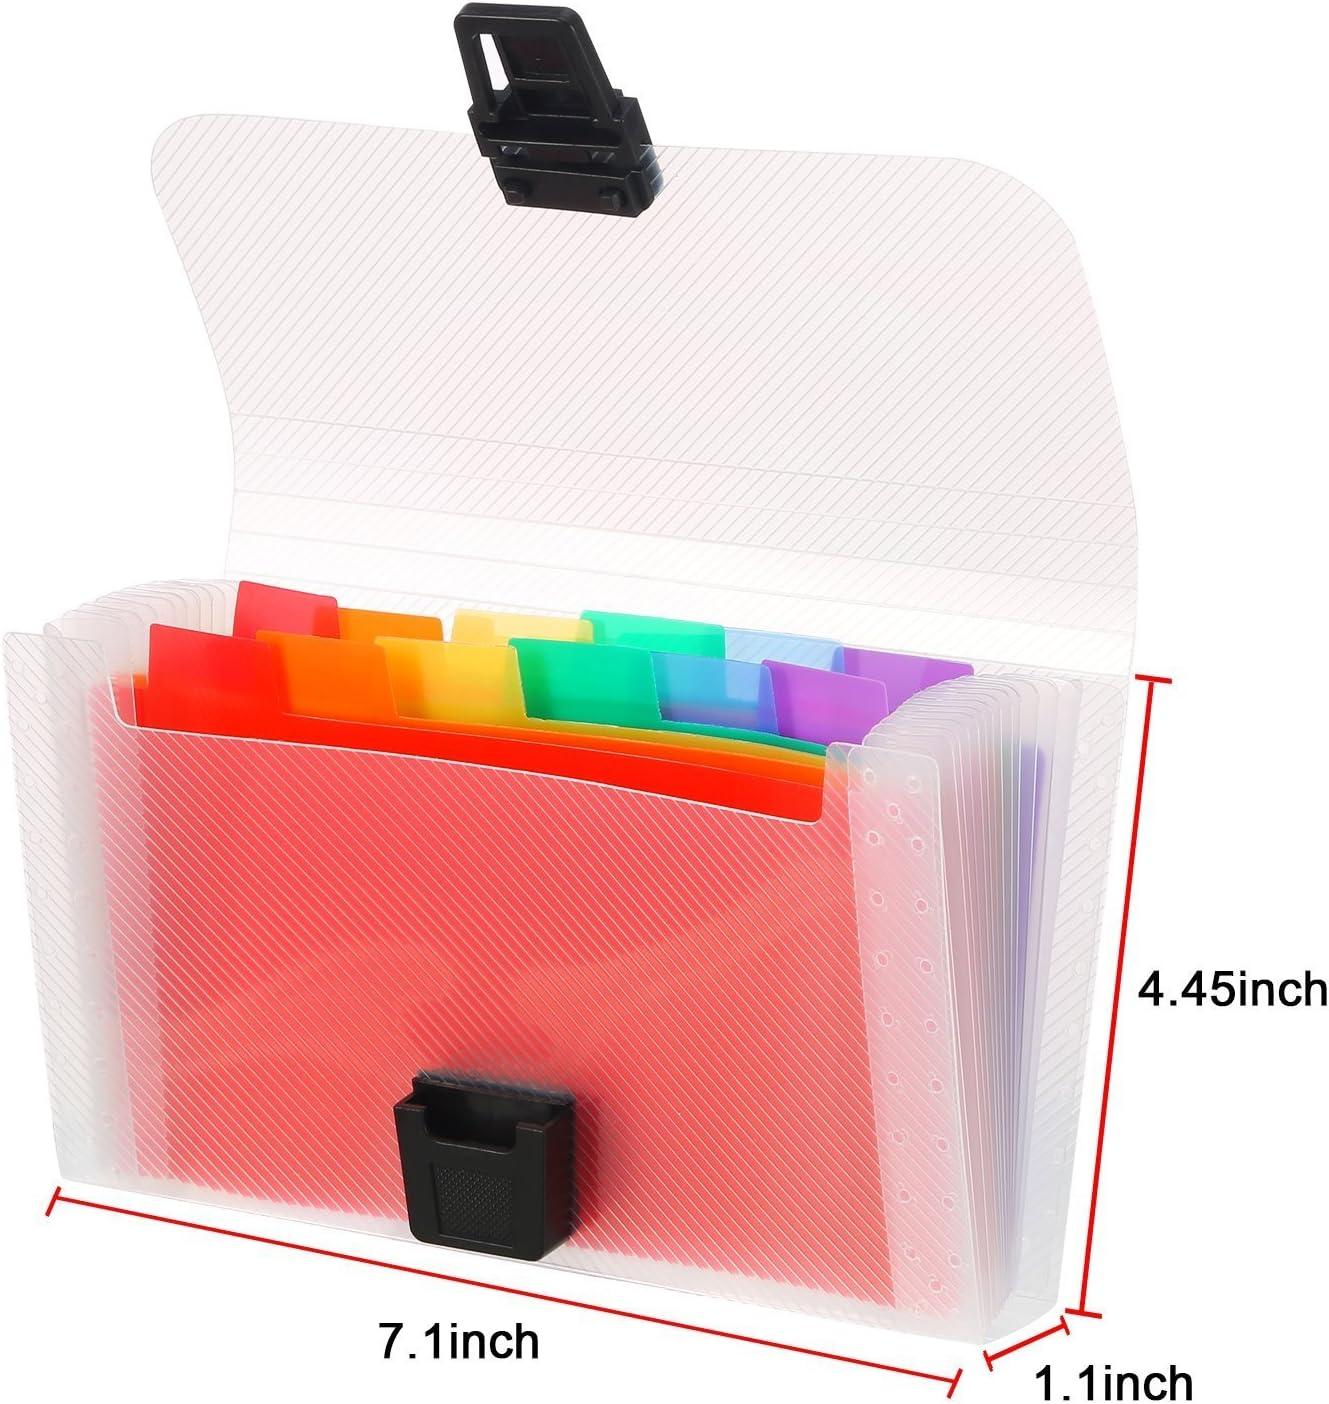 A6 Mini Expanding File Folder 13 Pockets Portable Rainbow Document Accordion File Folder Receipt Organiser Wallet Case Multicoloured Plastic Expandable File Pockets with Colored Labels Index